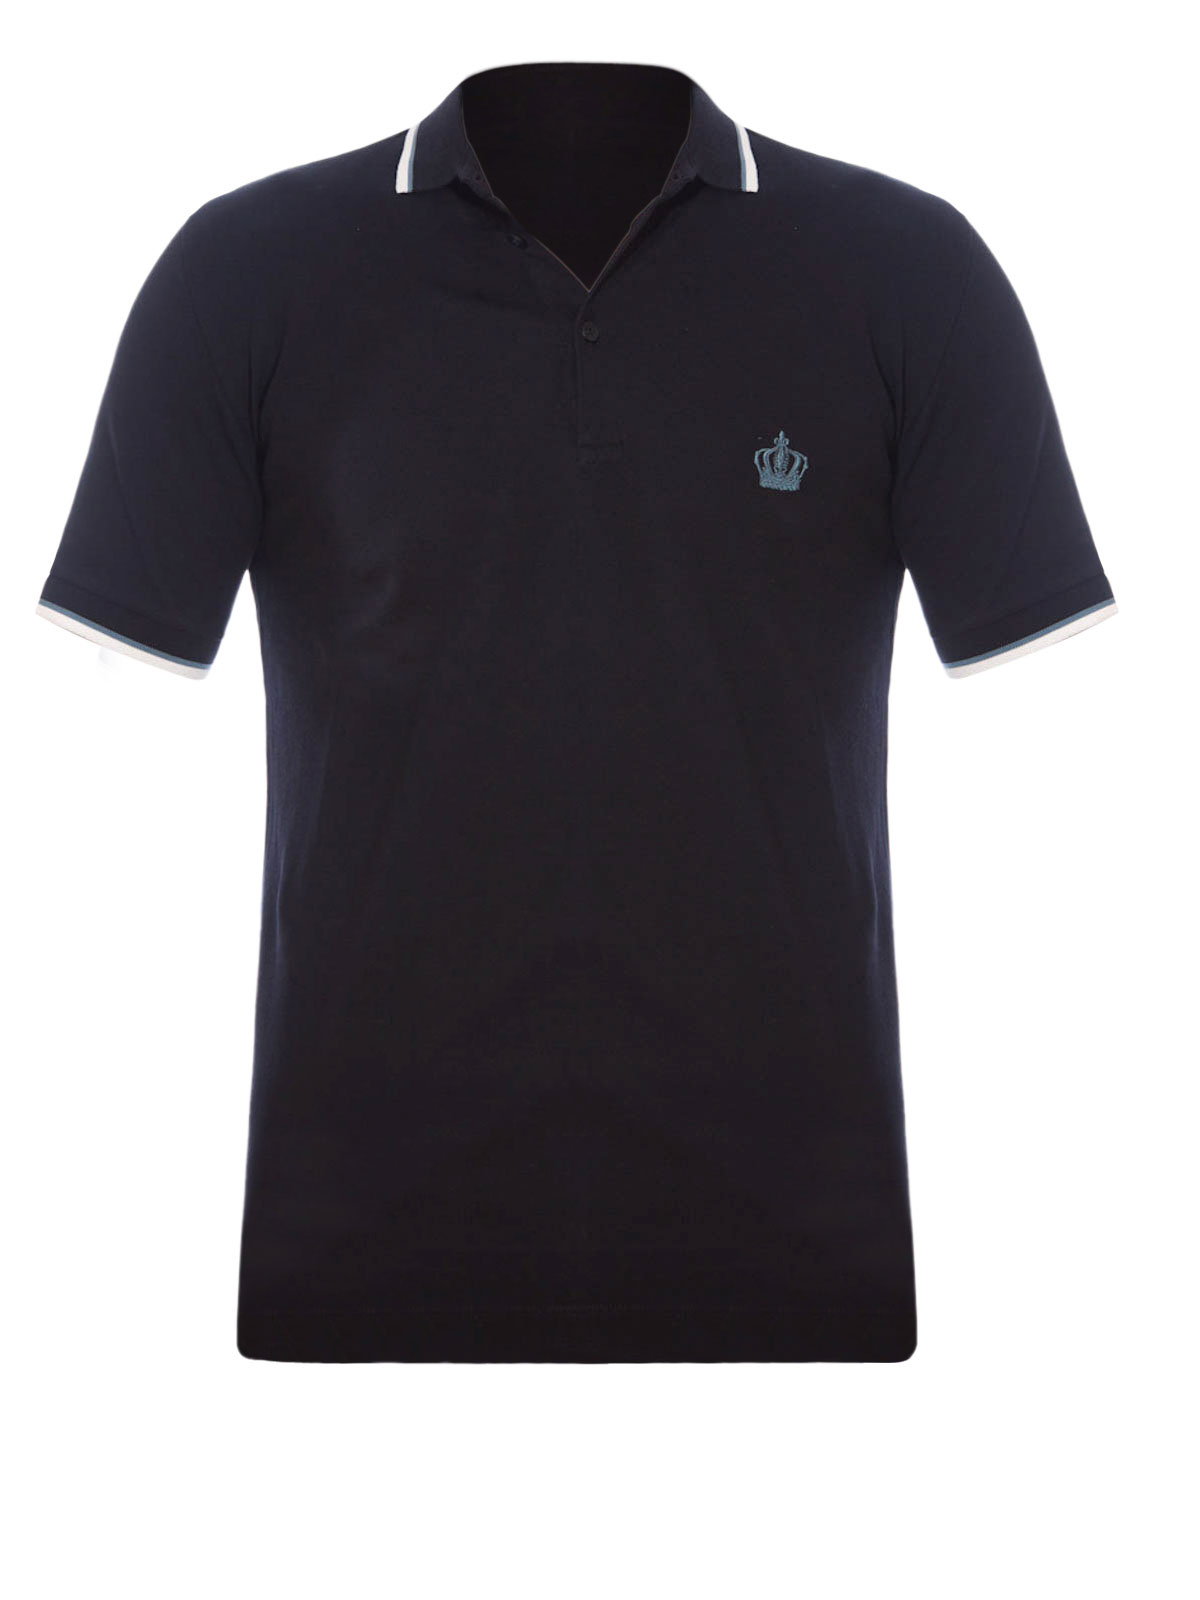 Stitched Logo Polo Shirt By Dolce Gabbana Polo Shirts